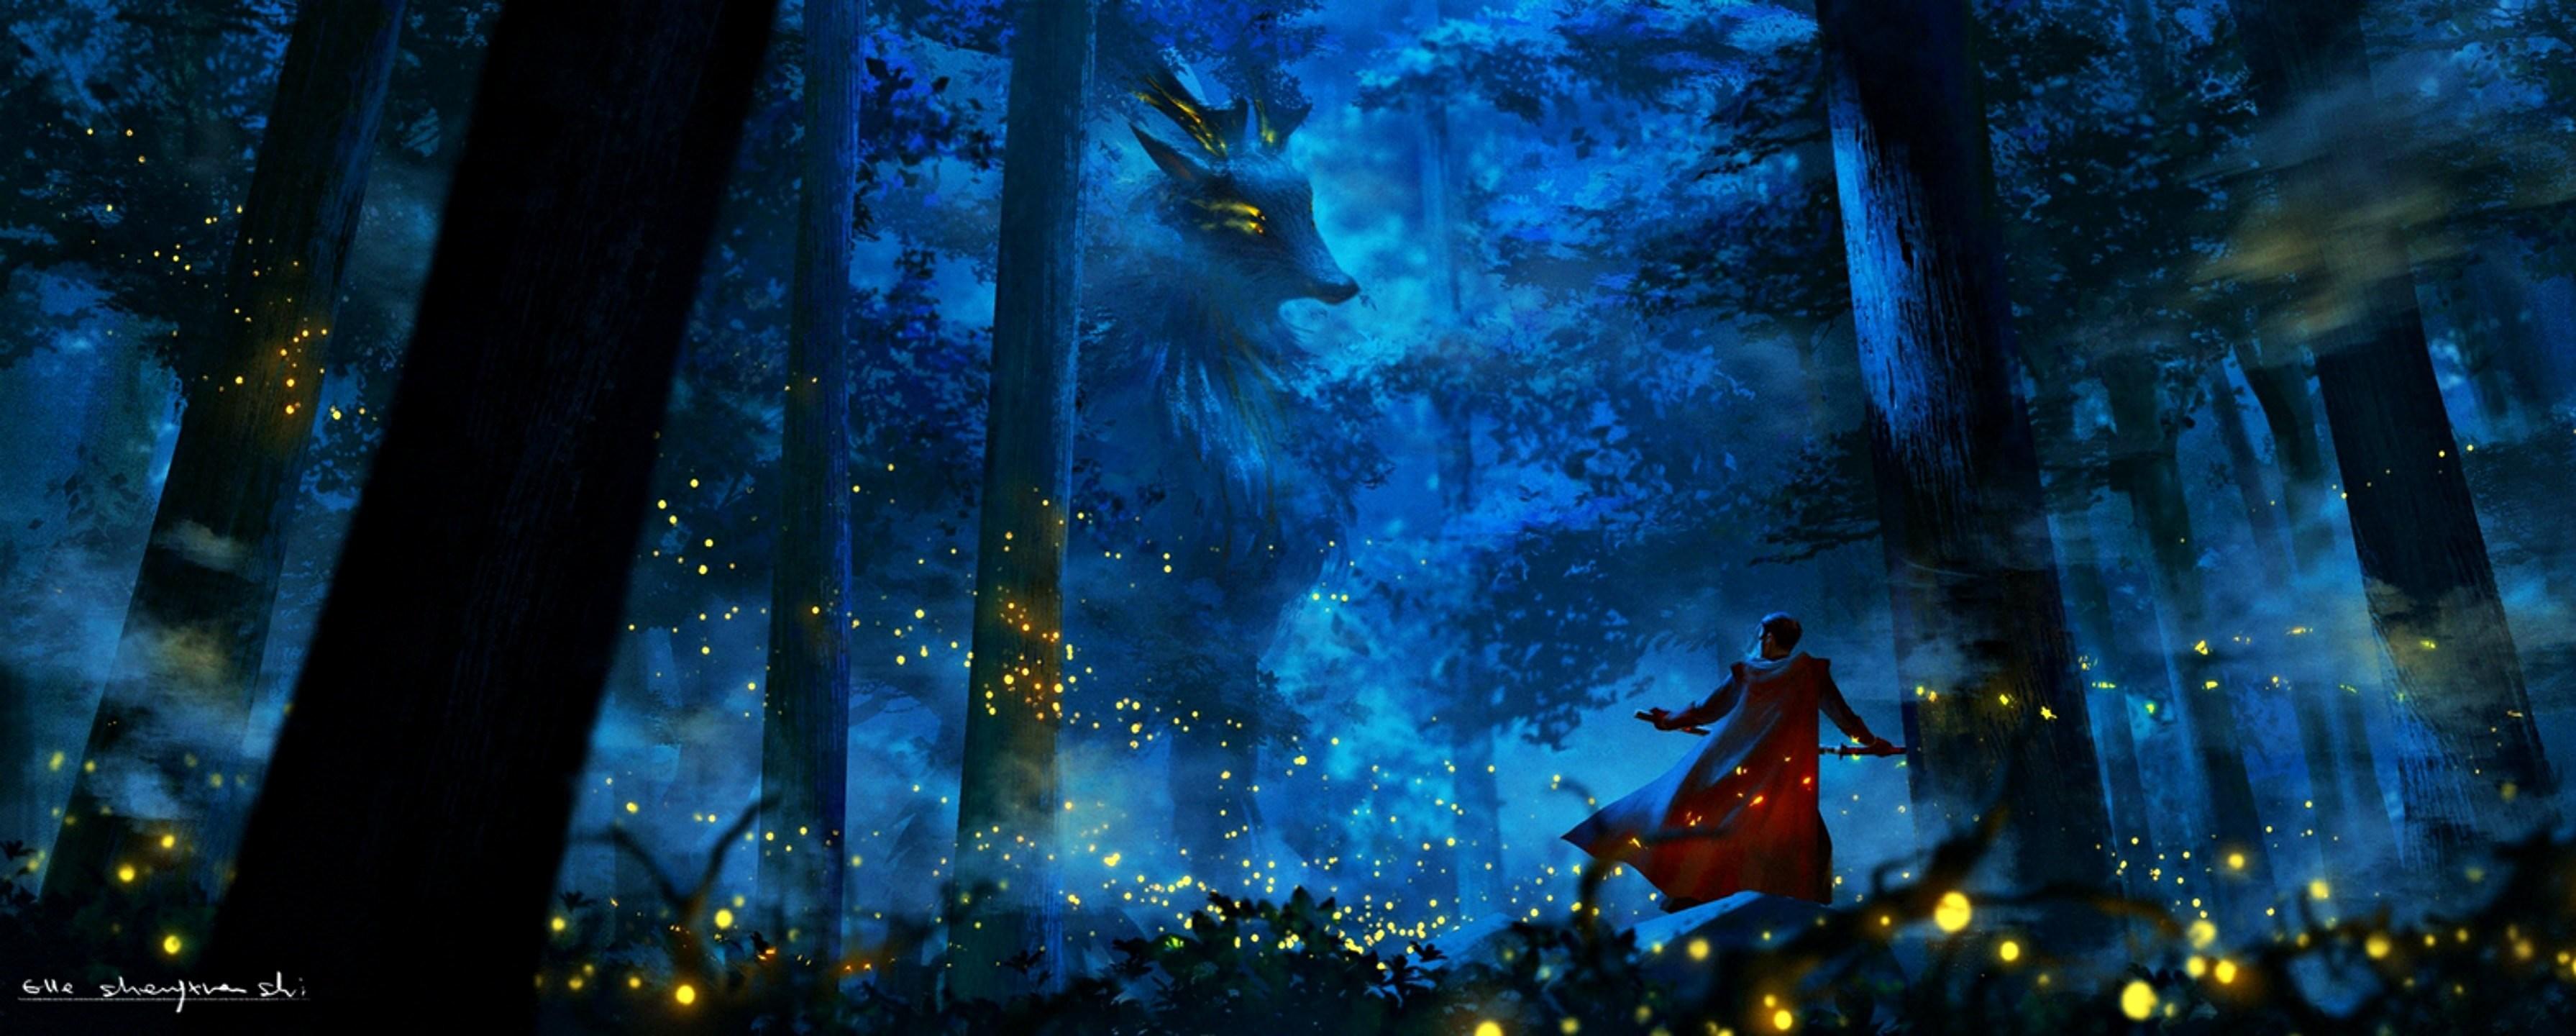 Magical Wallpaper Images 74